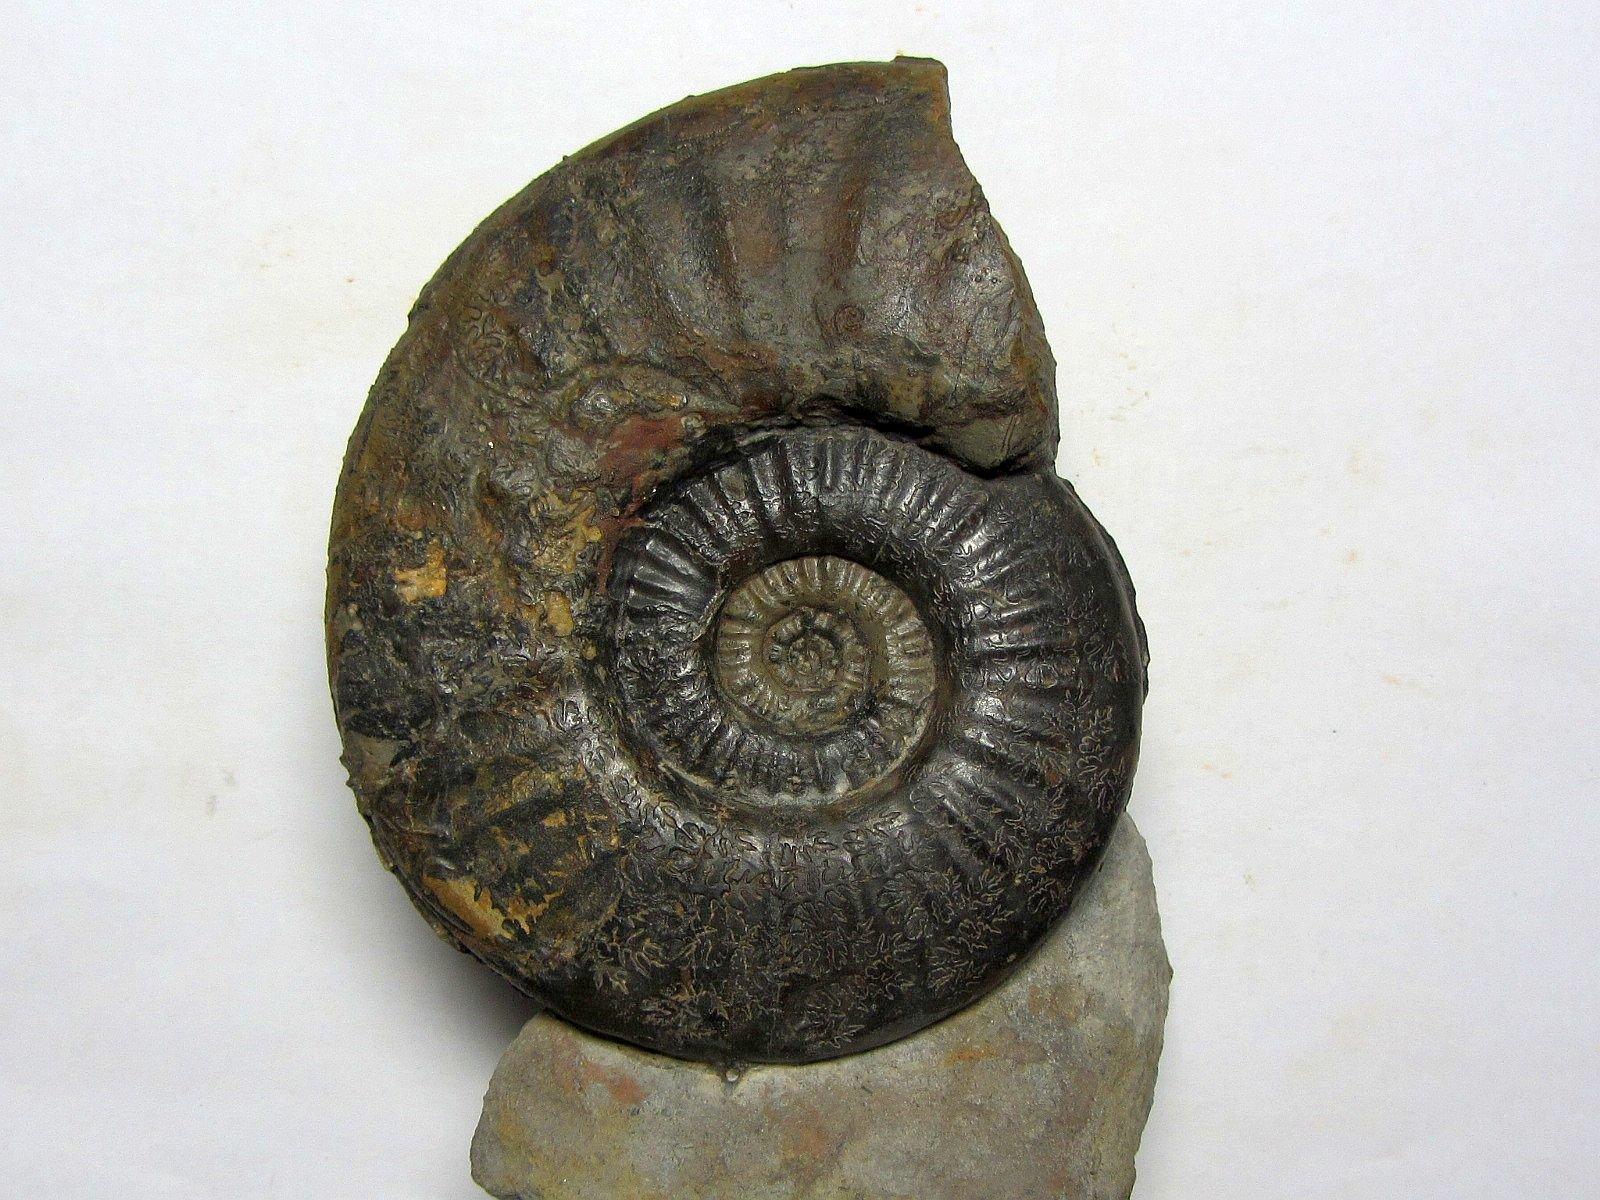 Sonninia (Euhoploceras) adicra (Waagen 1867)